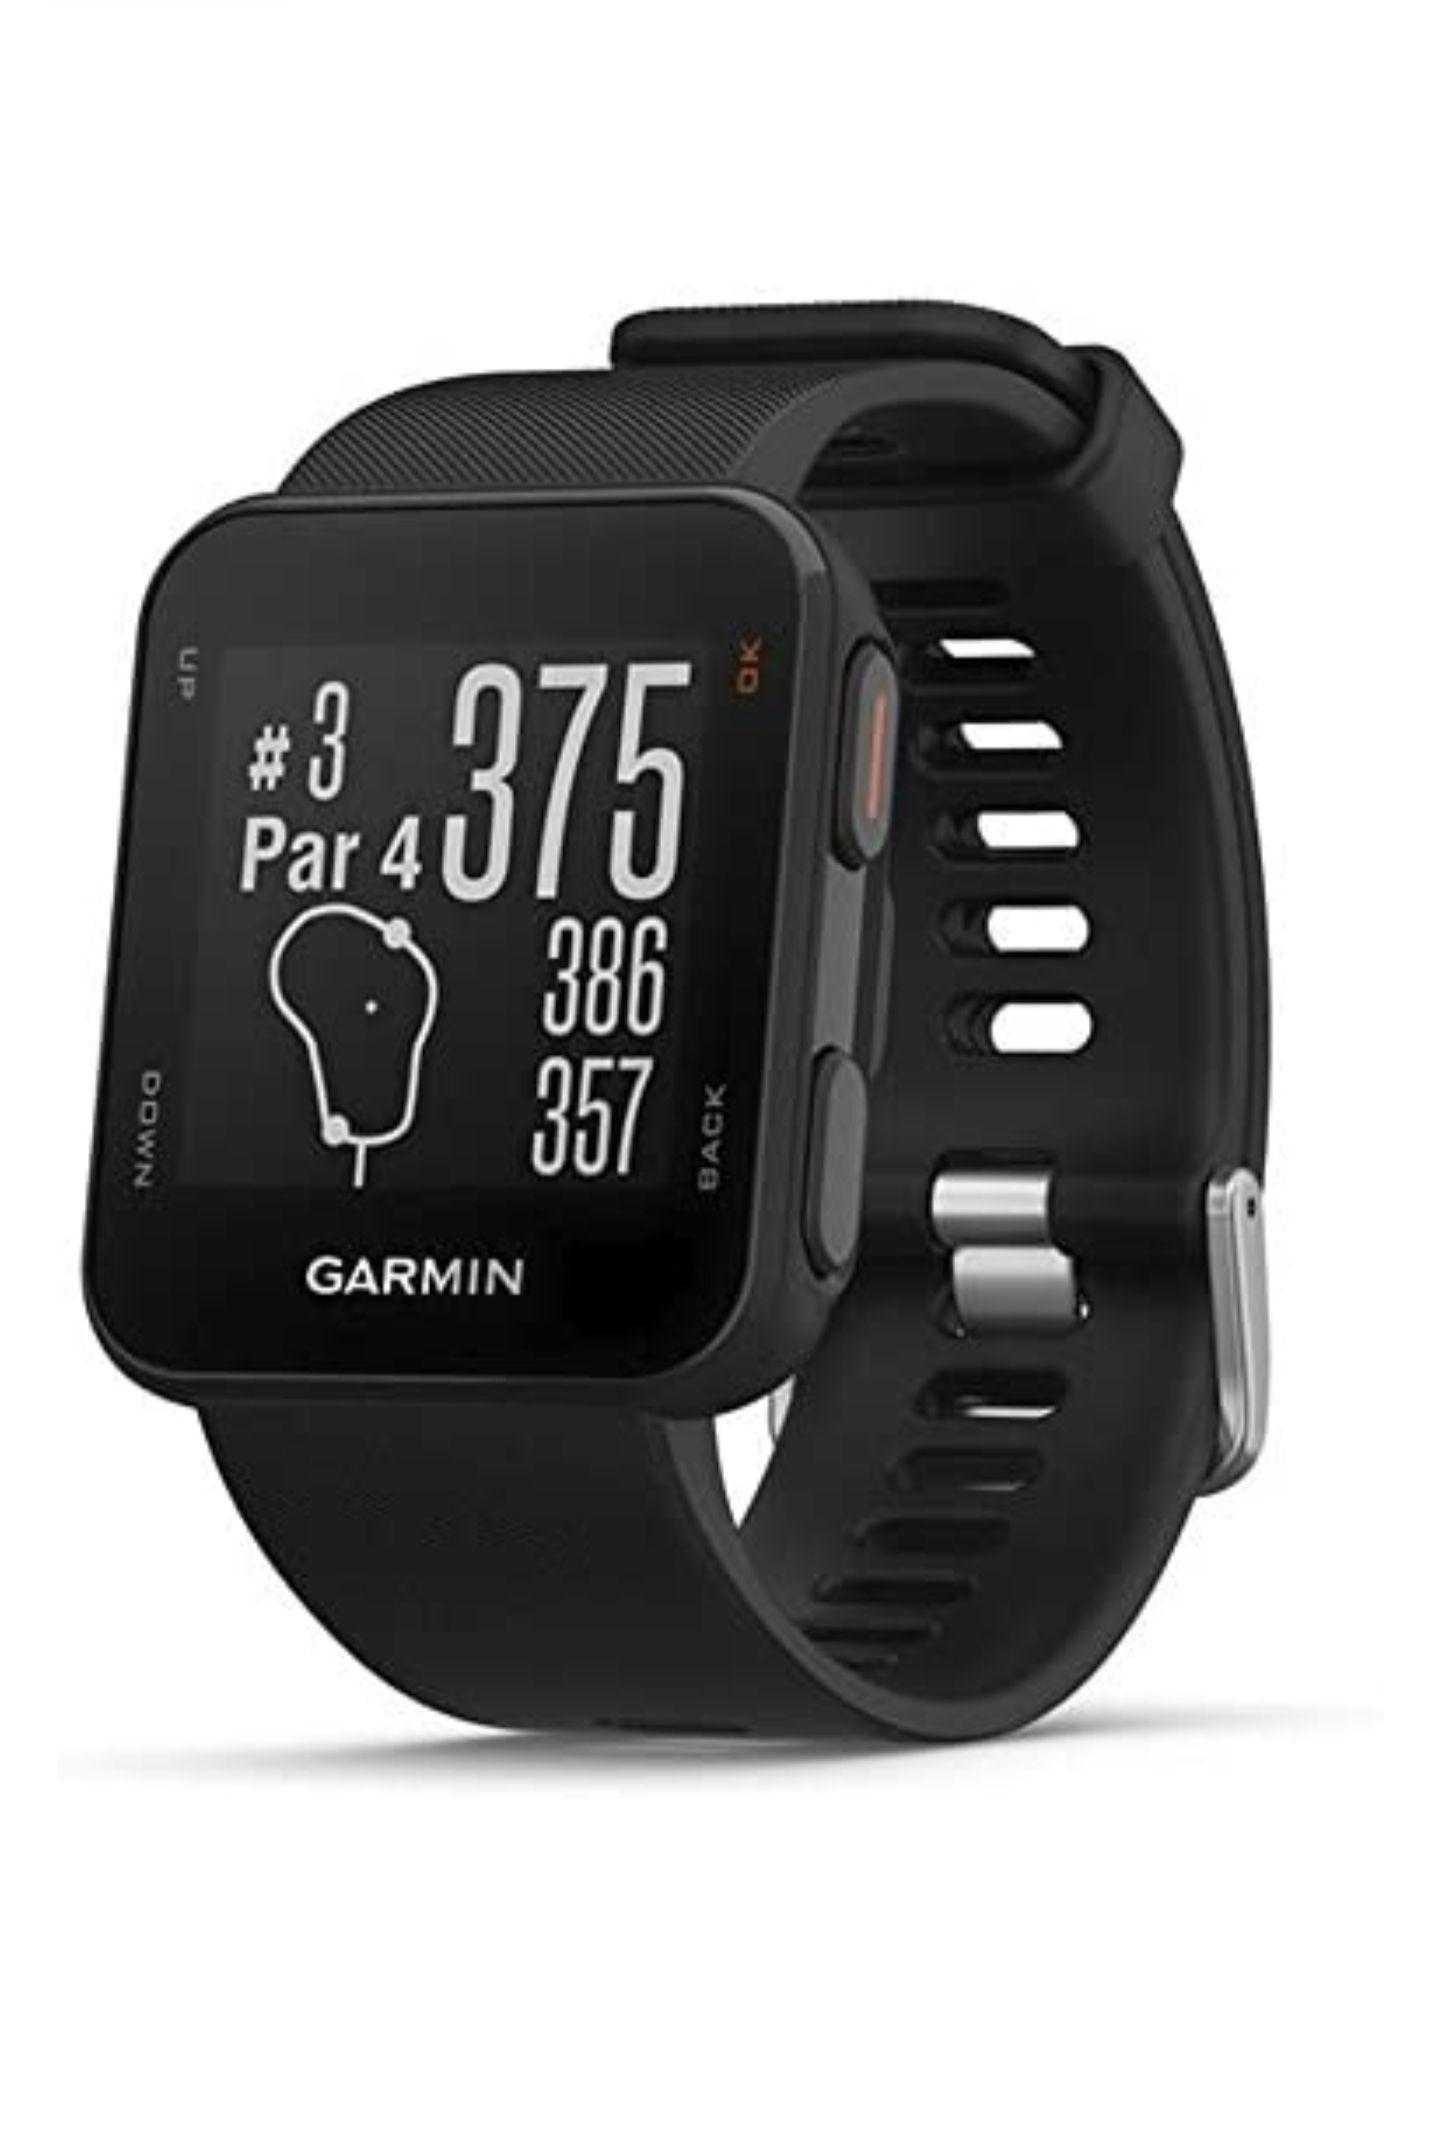 Garmin Approach S10 Lightweight GPS Golf Watch, Black £89 Amazon Prime Exclusive